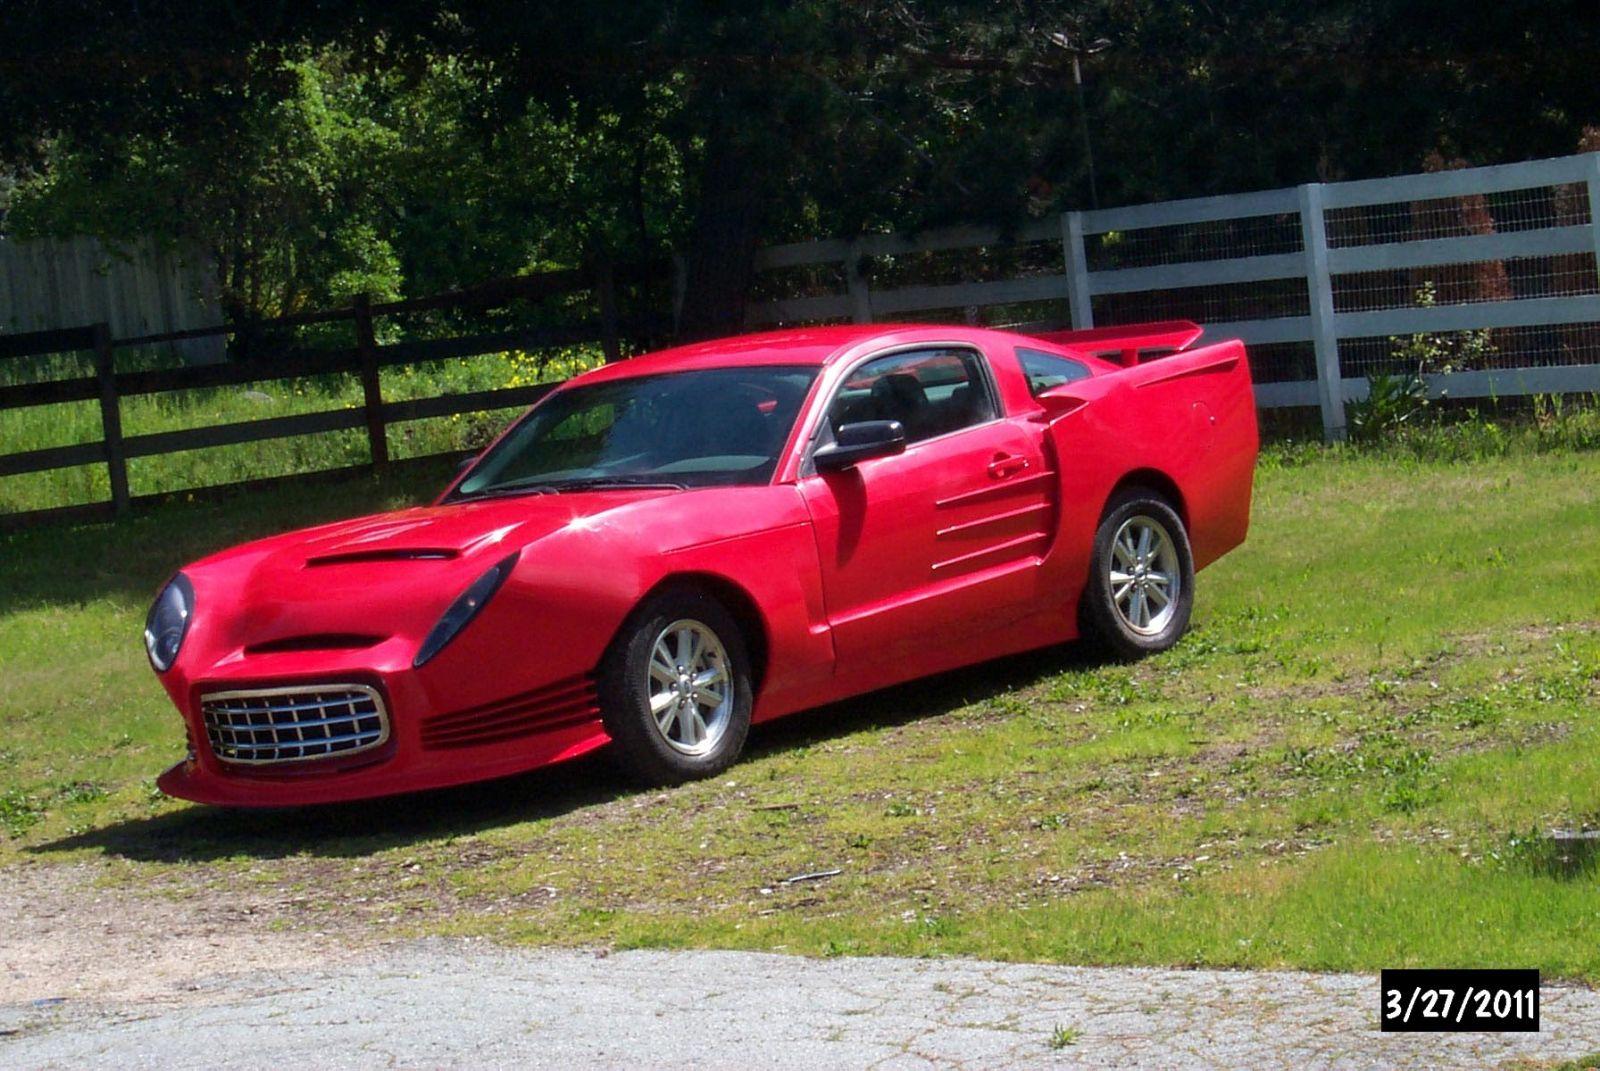 Ford Mustang CUSTOM For Sale Carmel Valley California - 2007 mustang